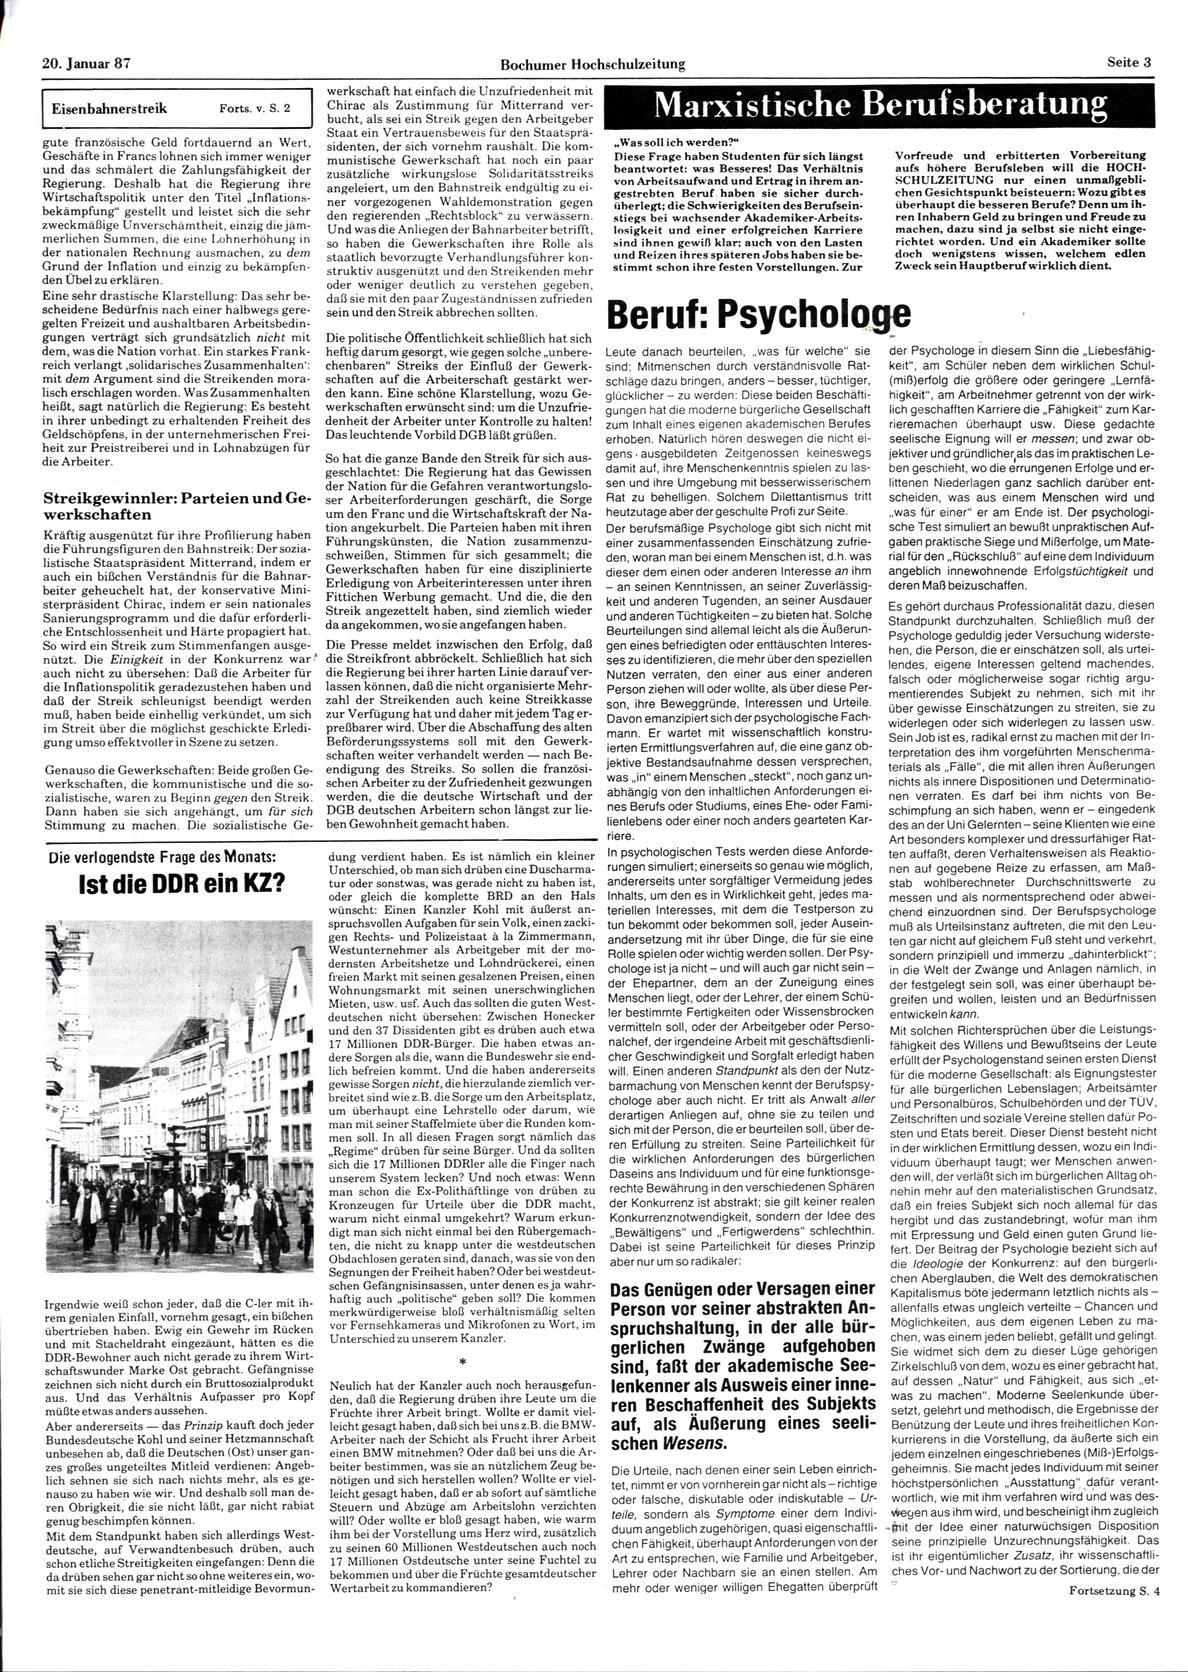 Bochum_BHZ_19870120_144_003